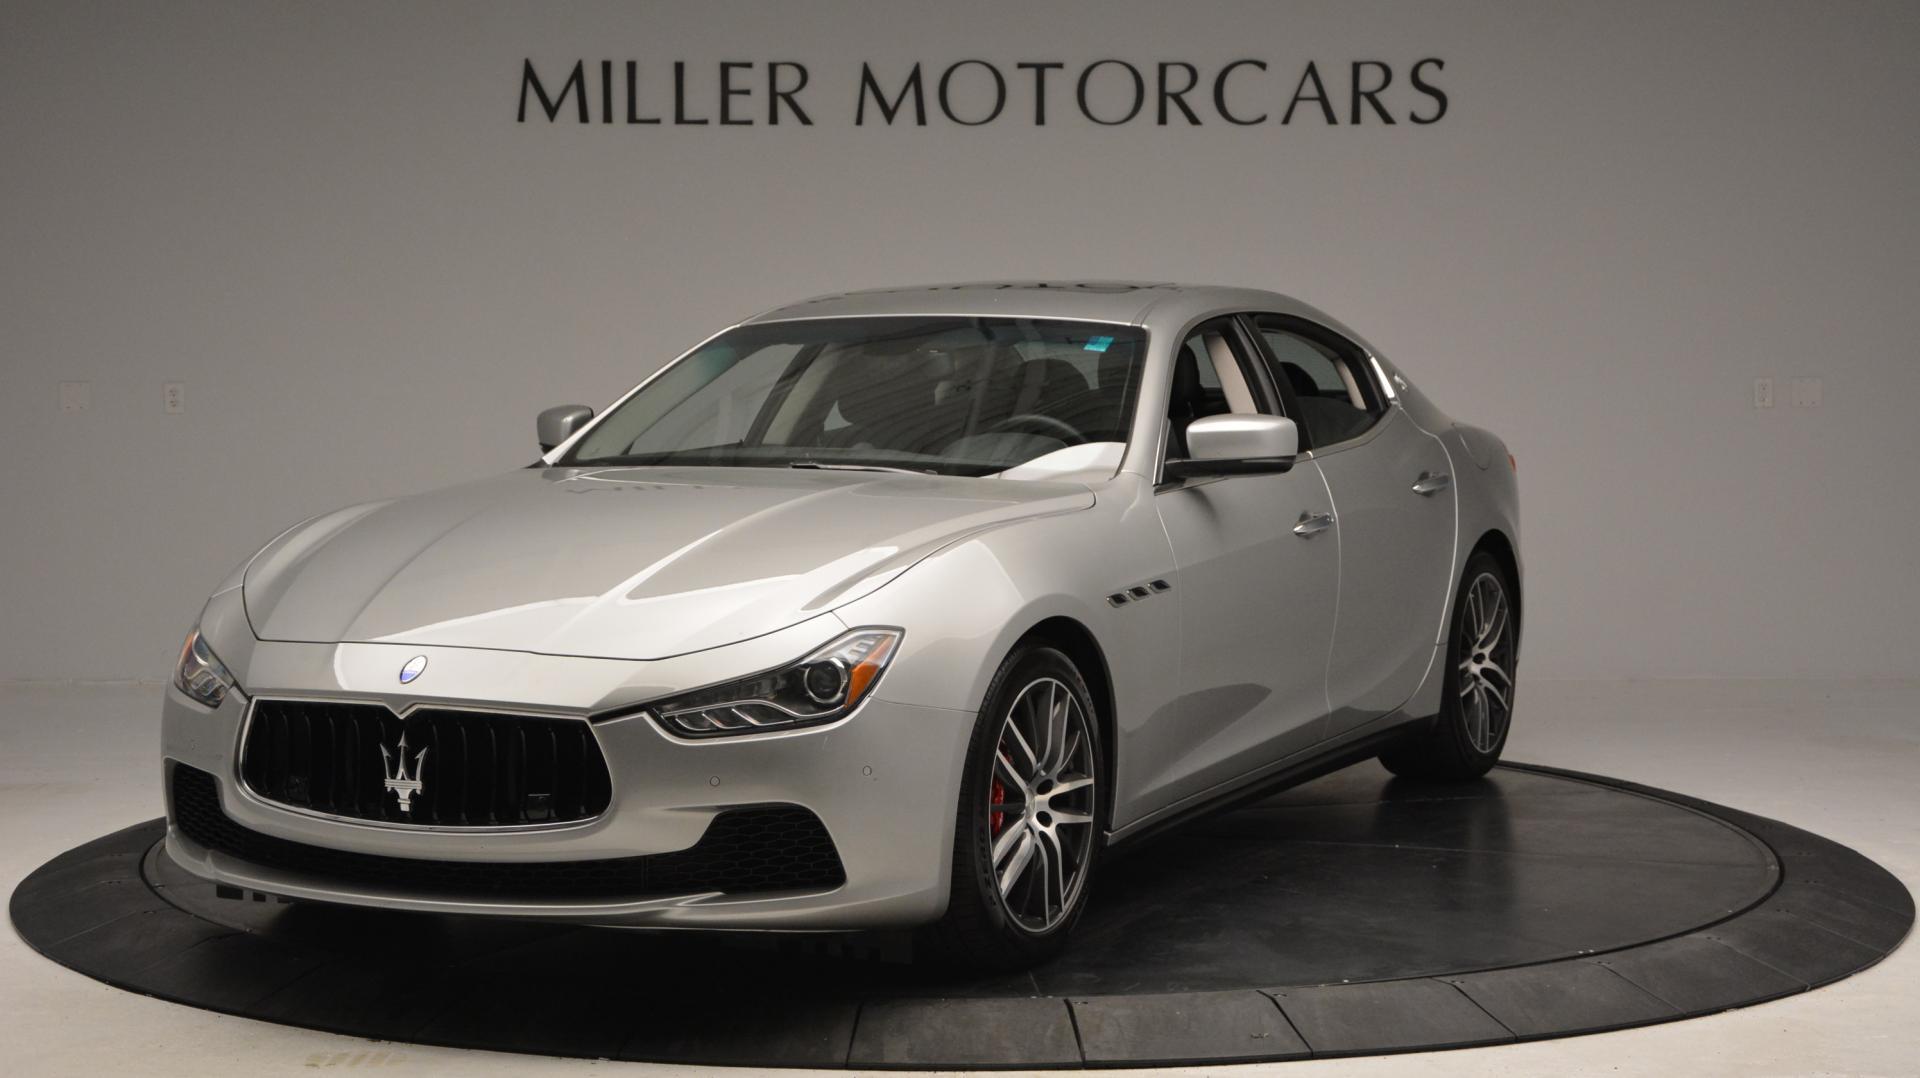 New 2016 Maserati Ghibli S Q4 For Sale In Westport, CT 63_main